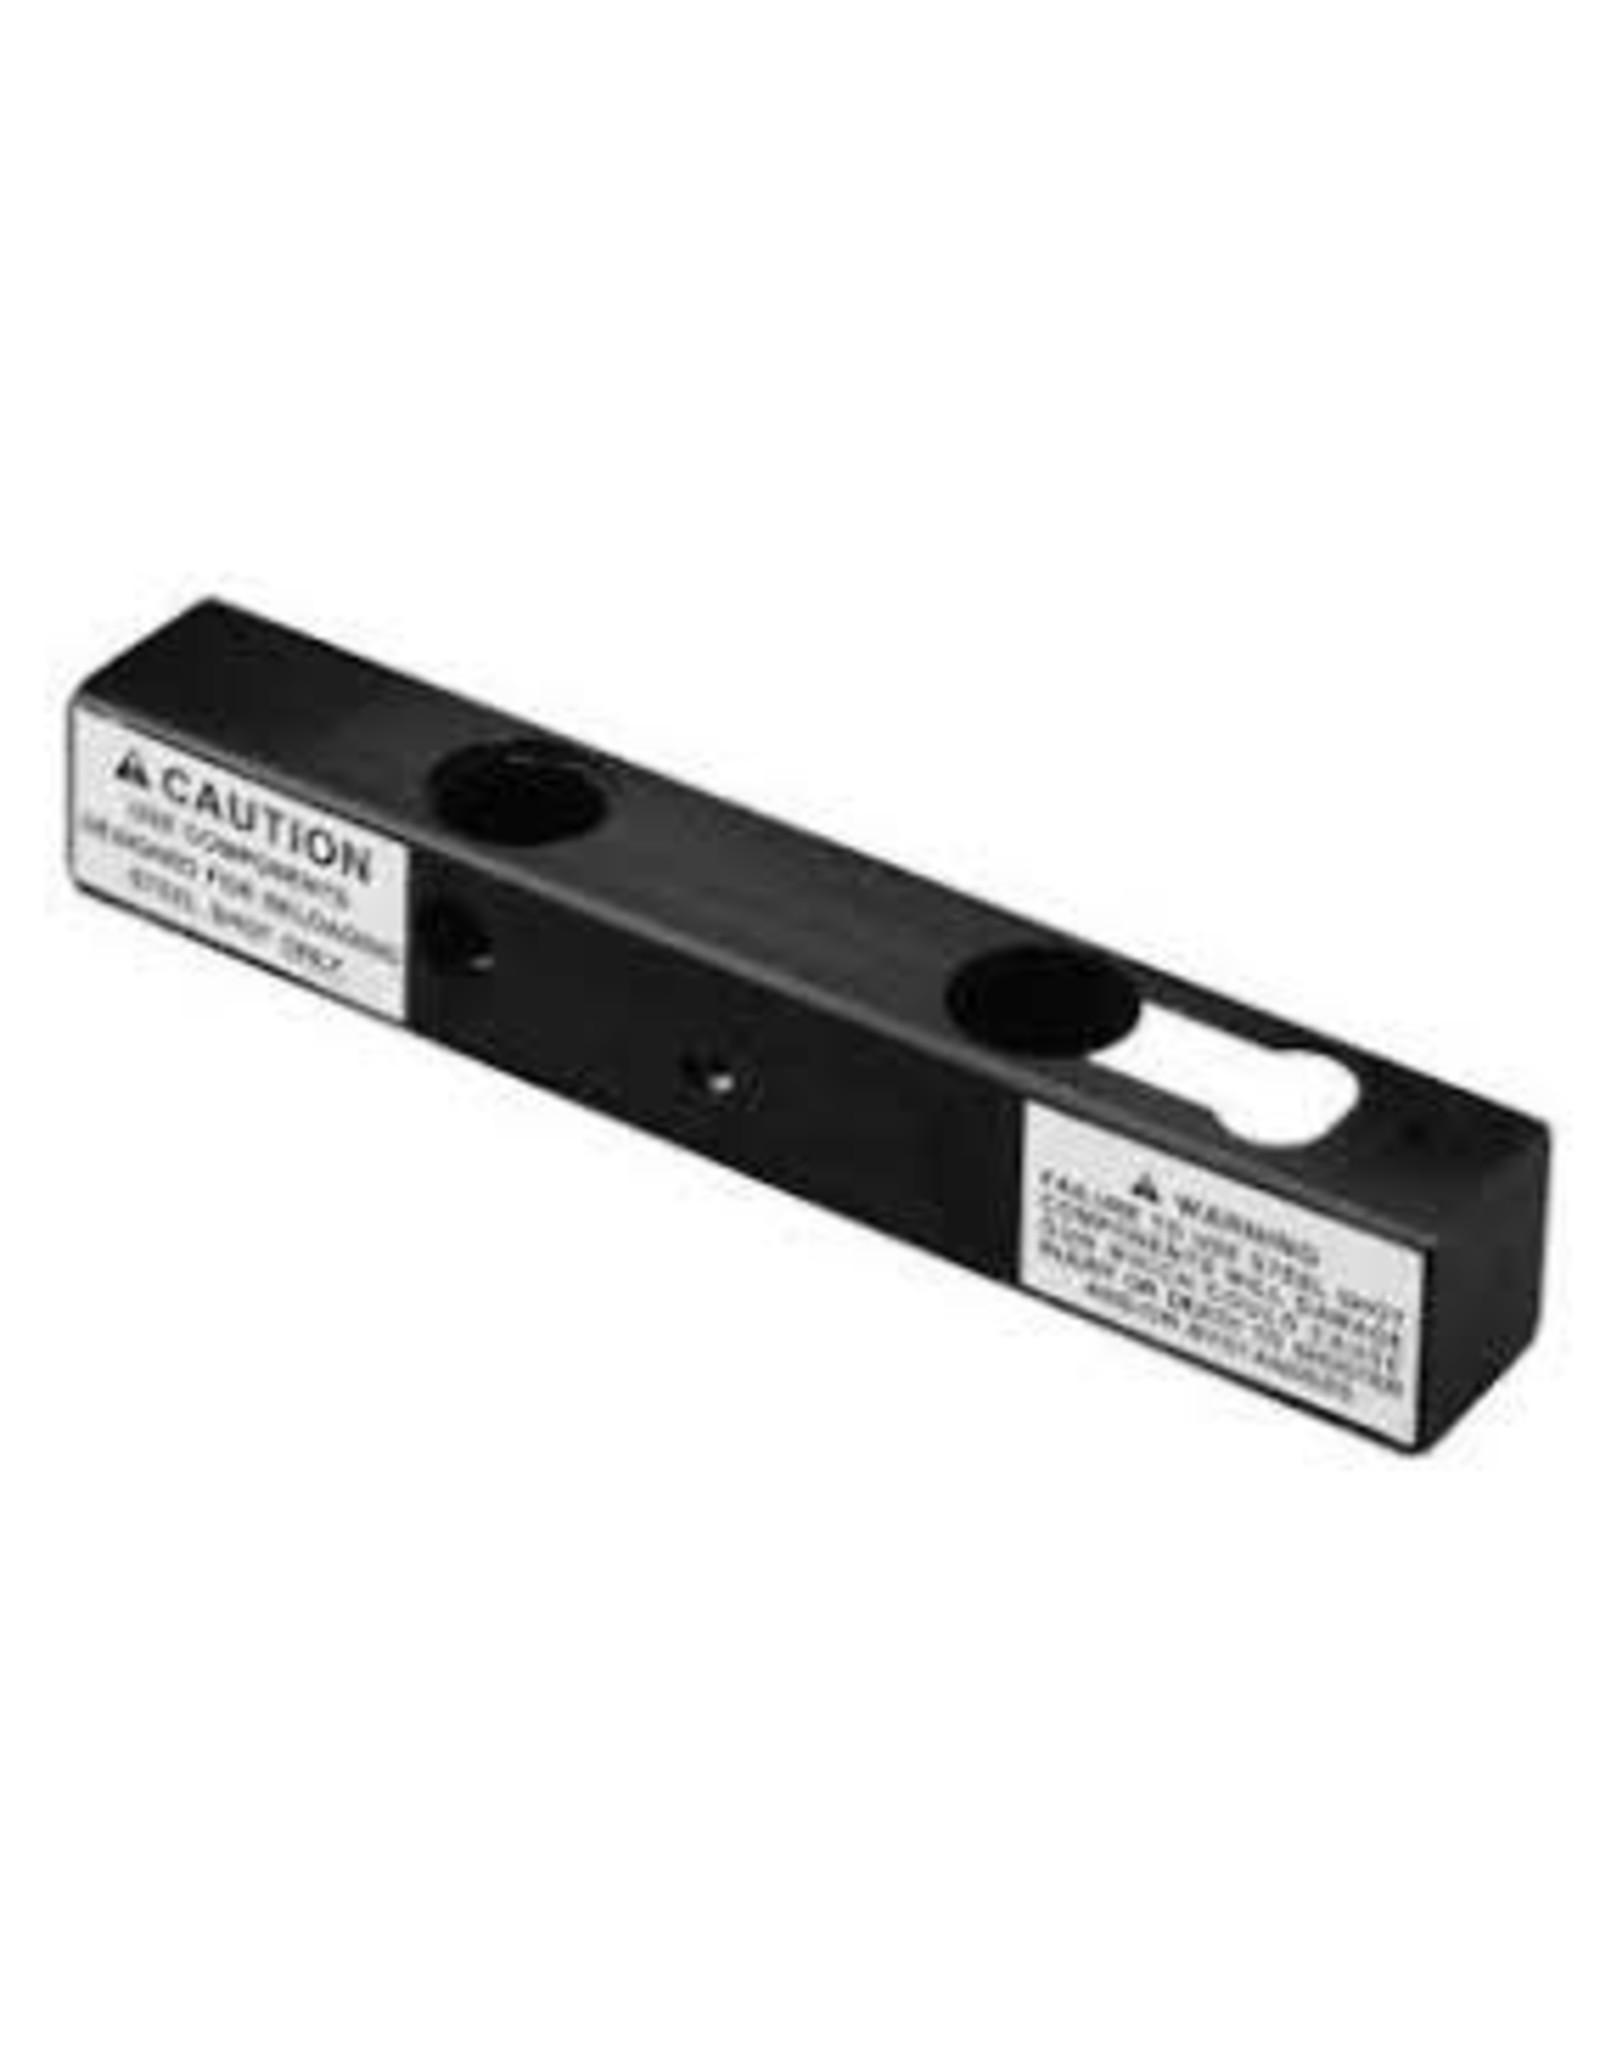 MEC MEC Steel Shot Charge Bar 1-1/8 OZ #4 - #6